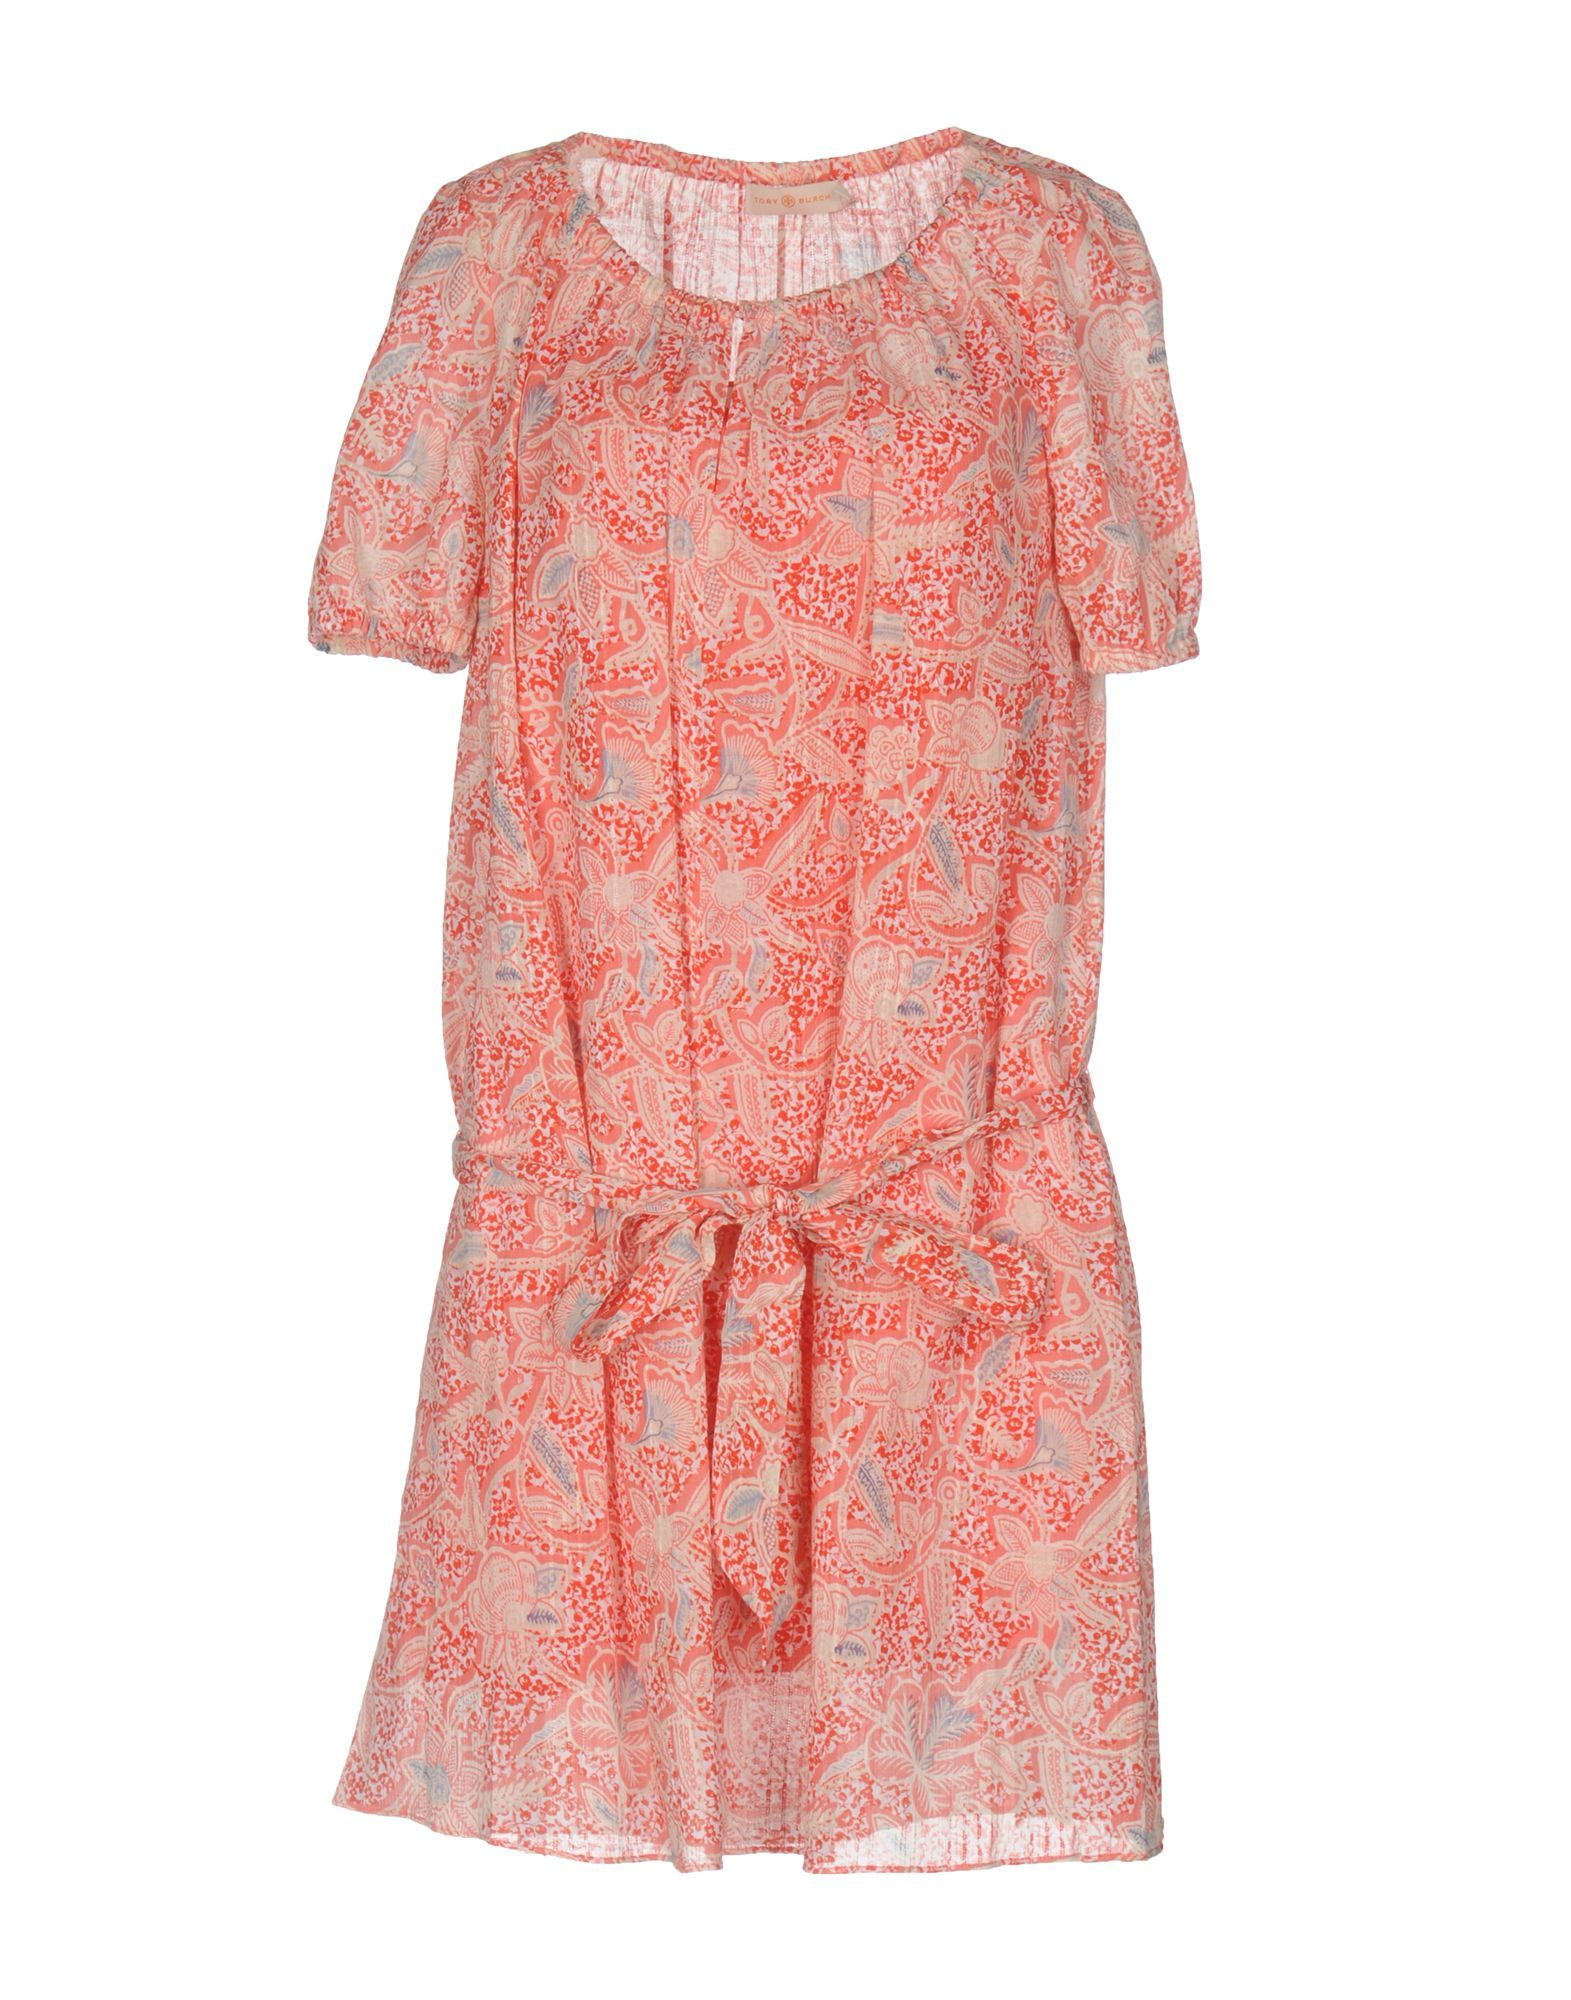 Tory Burch Red Floral Design Short Sleeve Dress